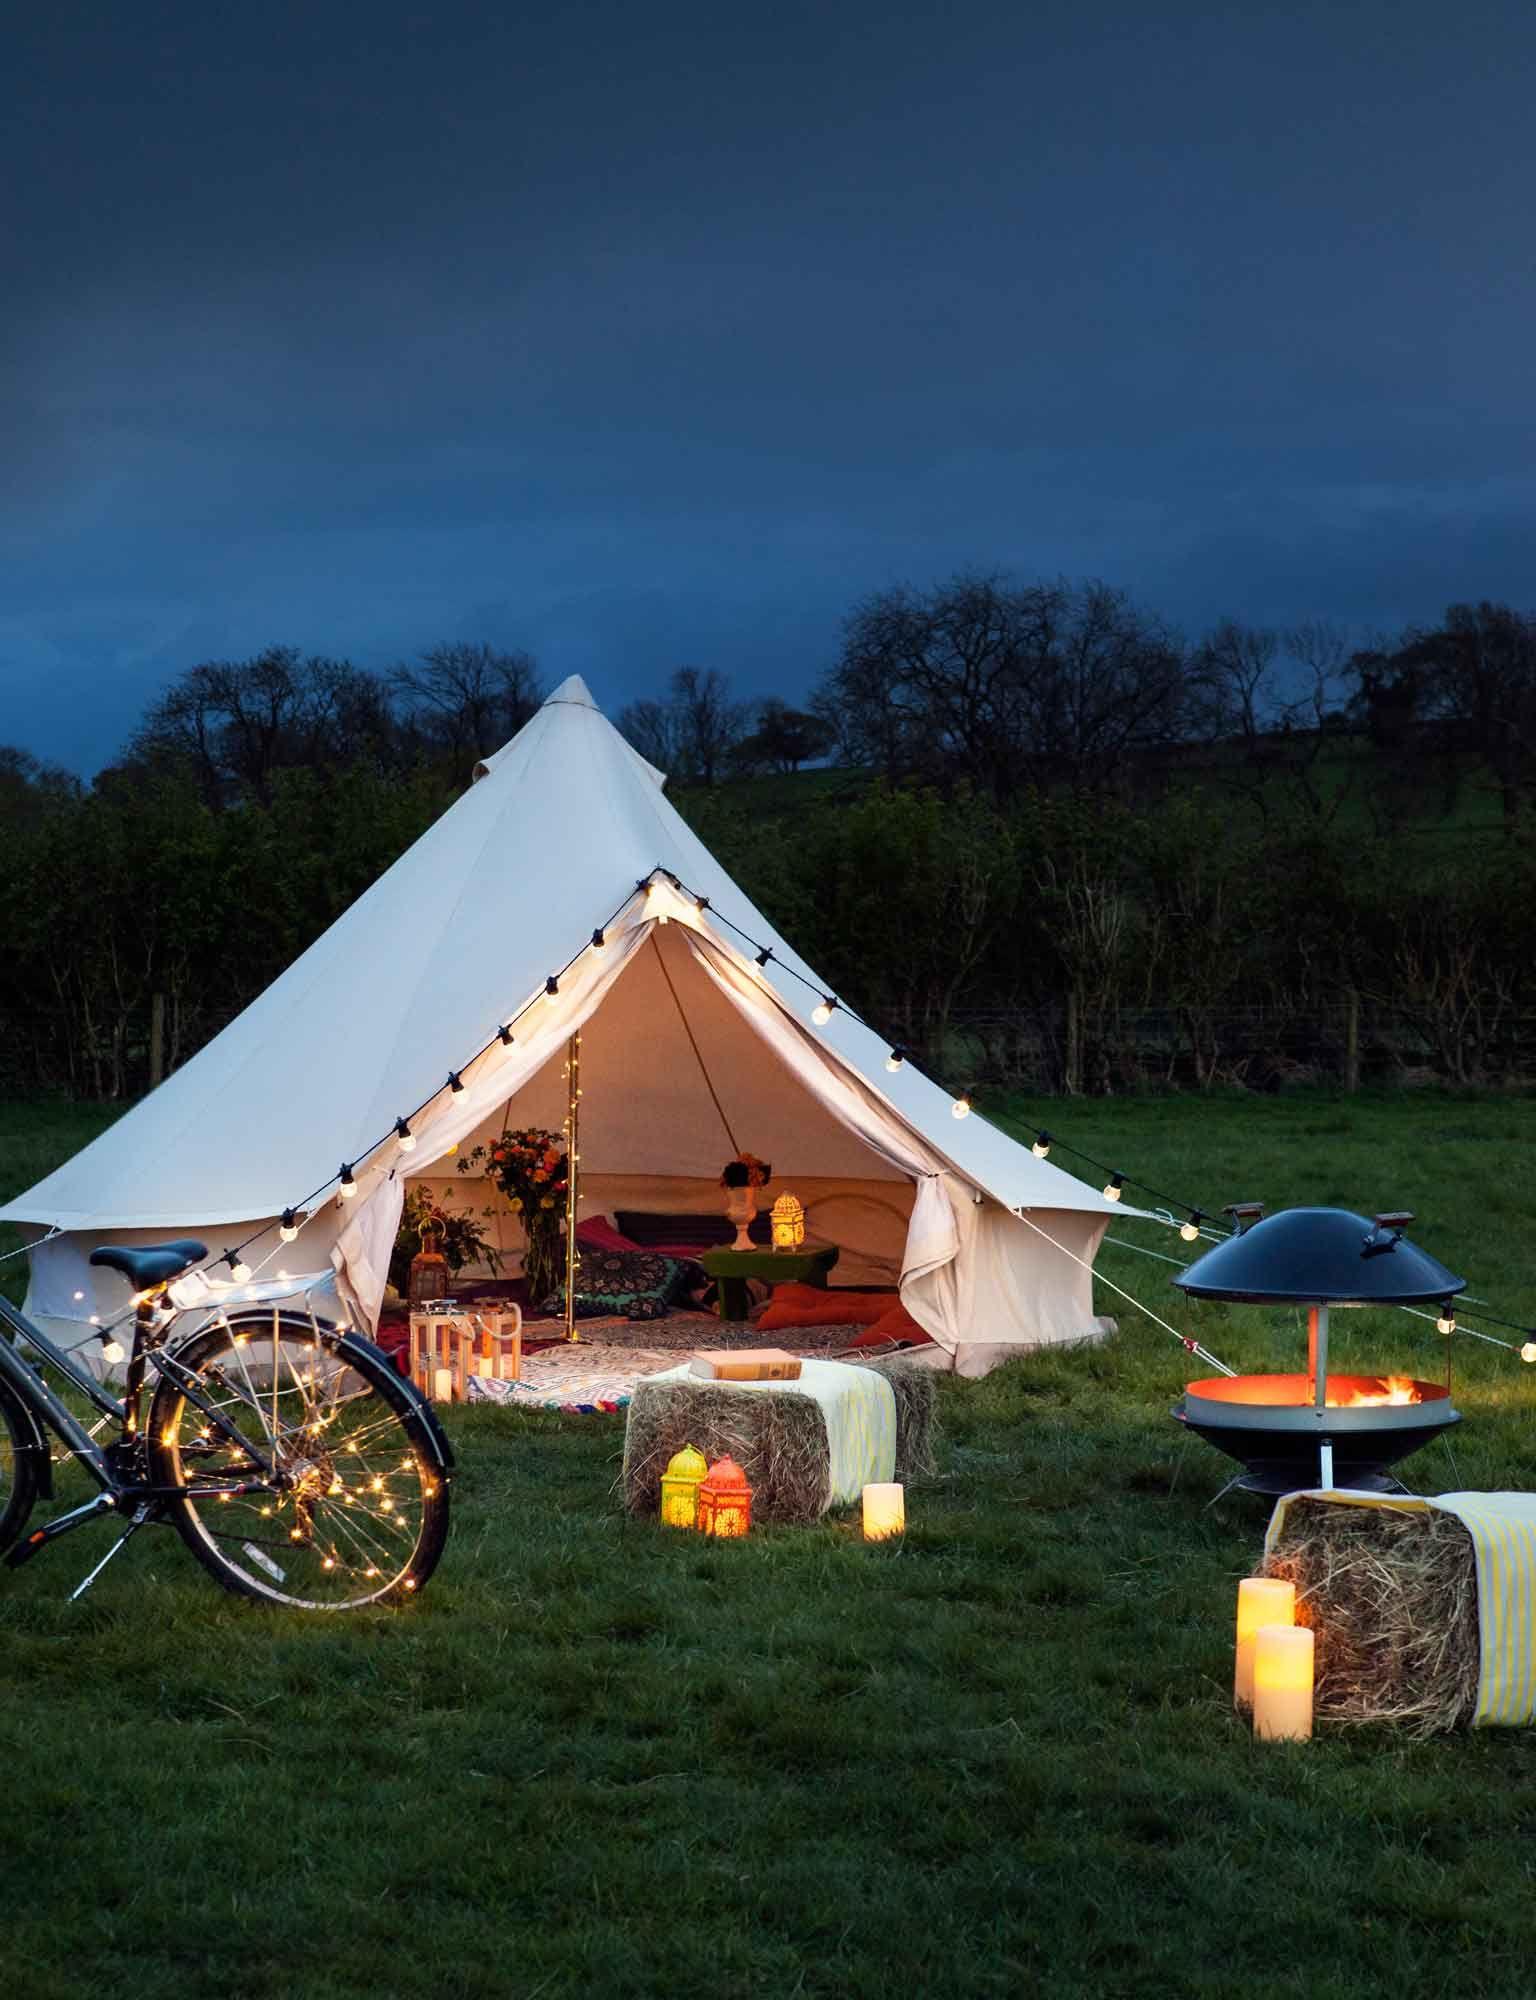 Camping Tent Ideas Cedar Trees A